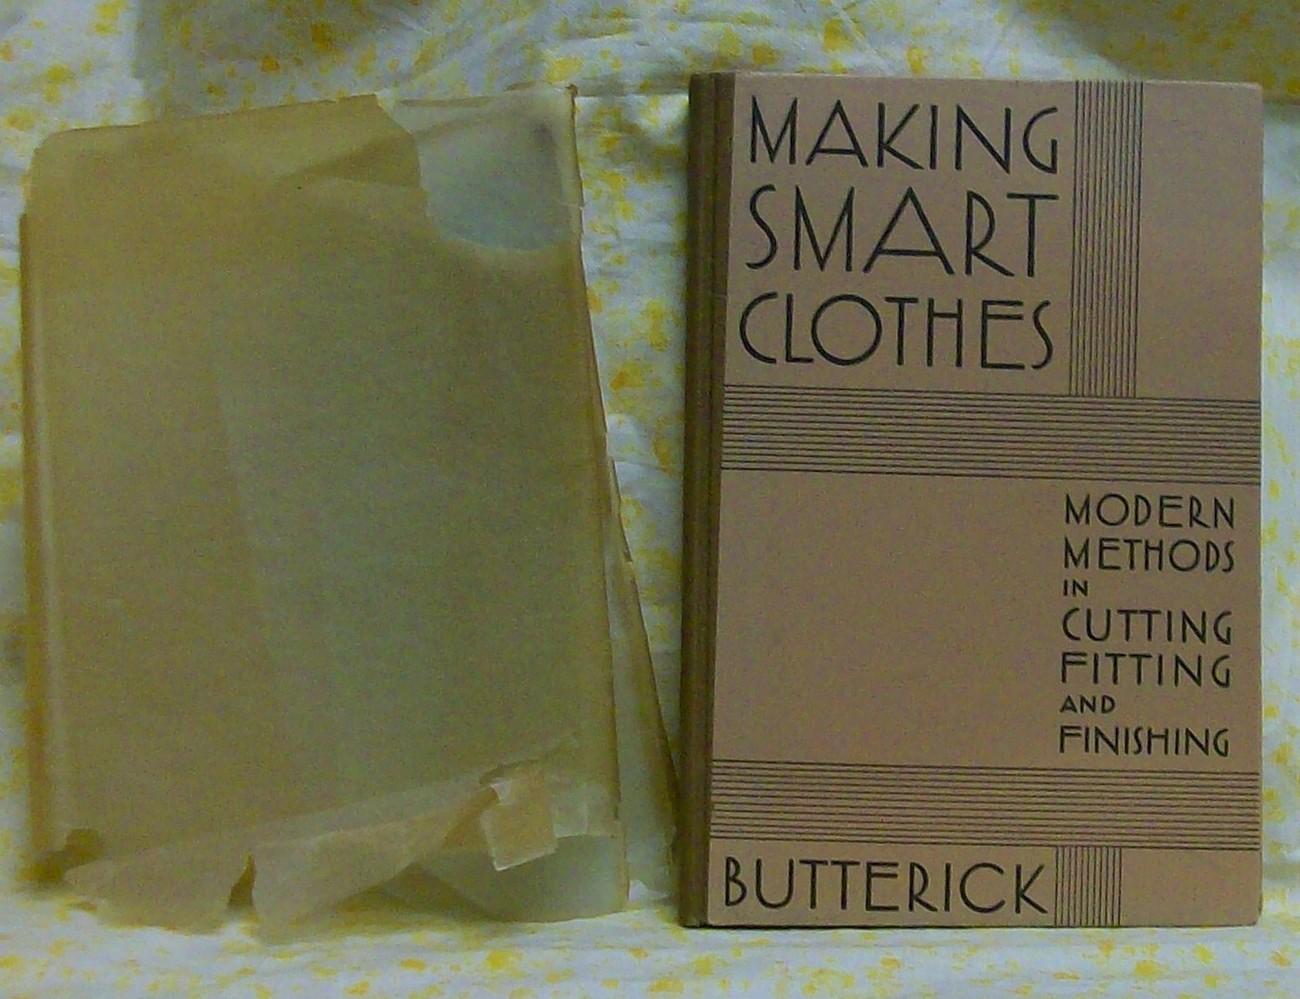 Smartclothes